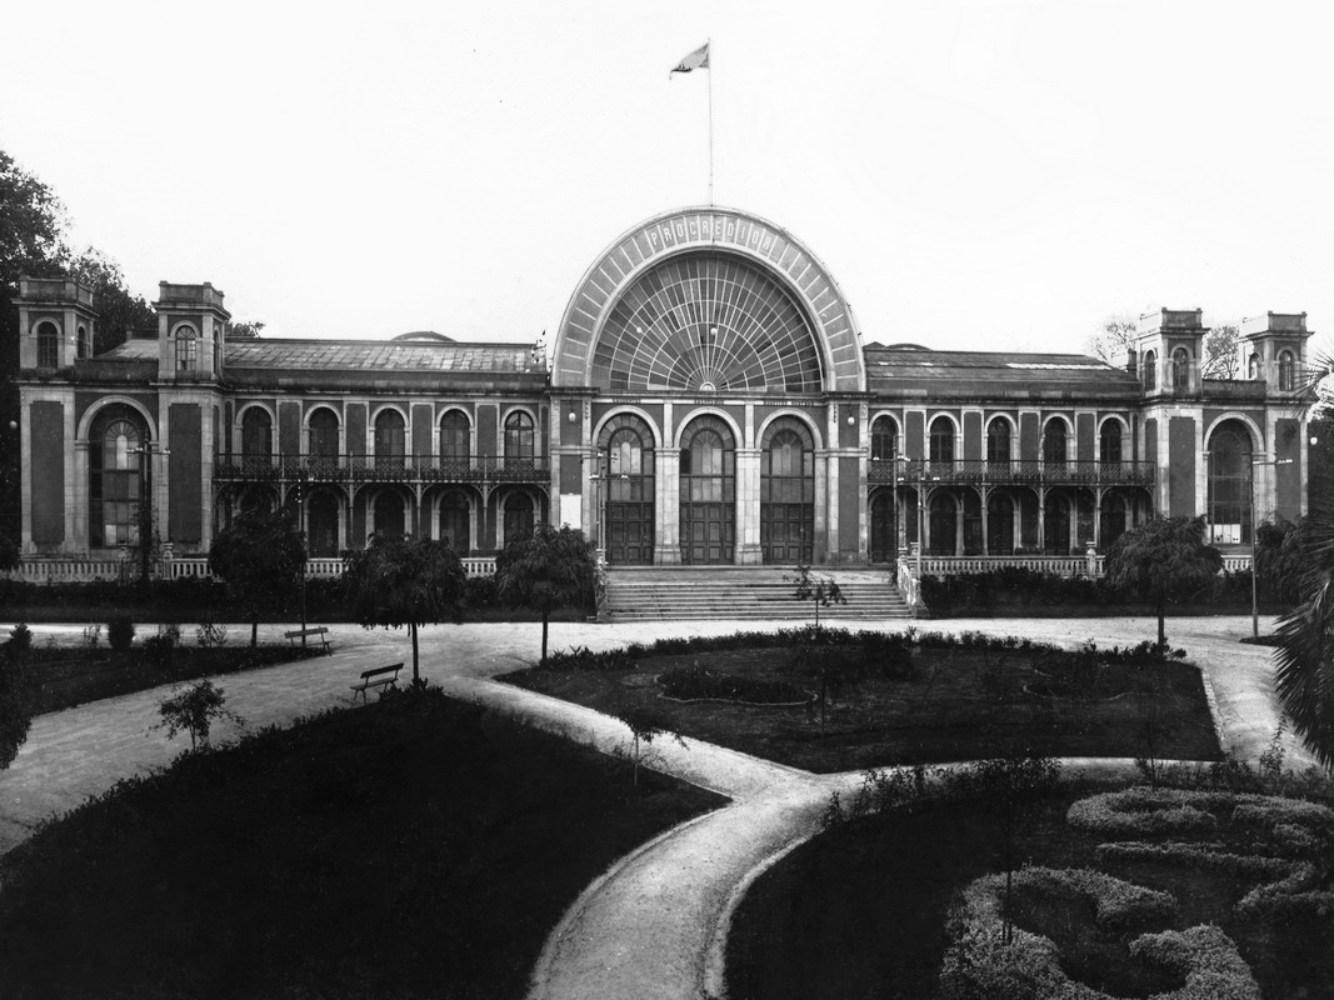 Jardins do Palácio de Cristal